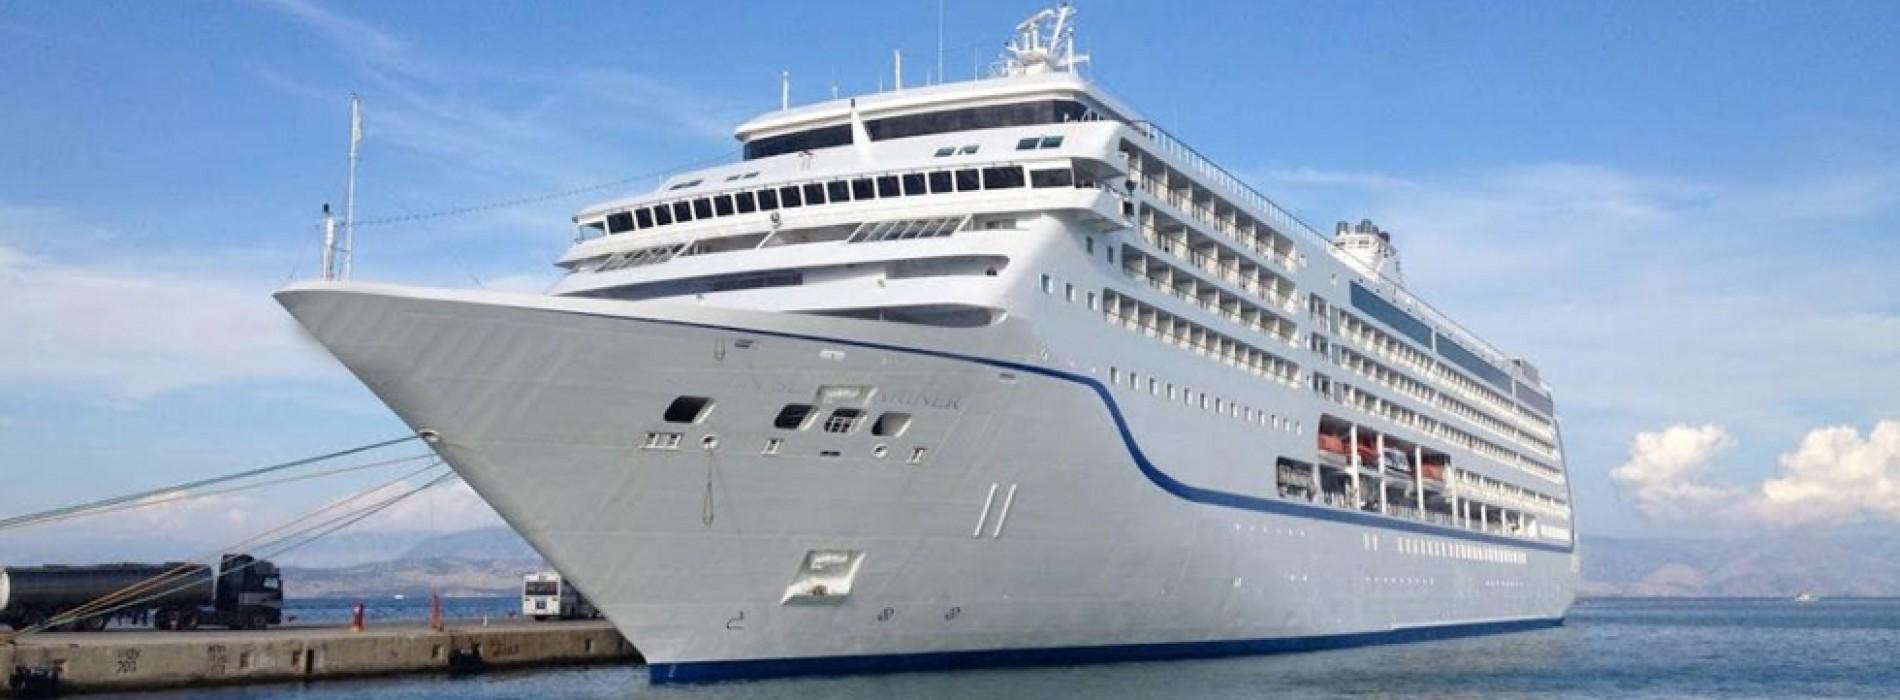 Mumbai-Goa cruise to cost Rs. 5,000 a night